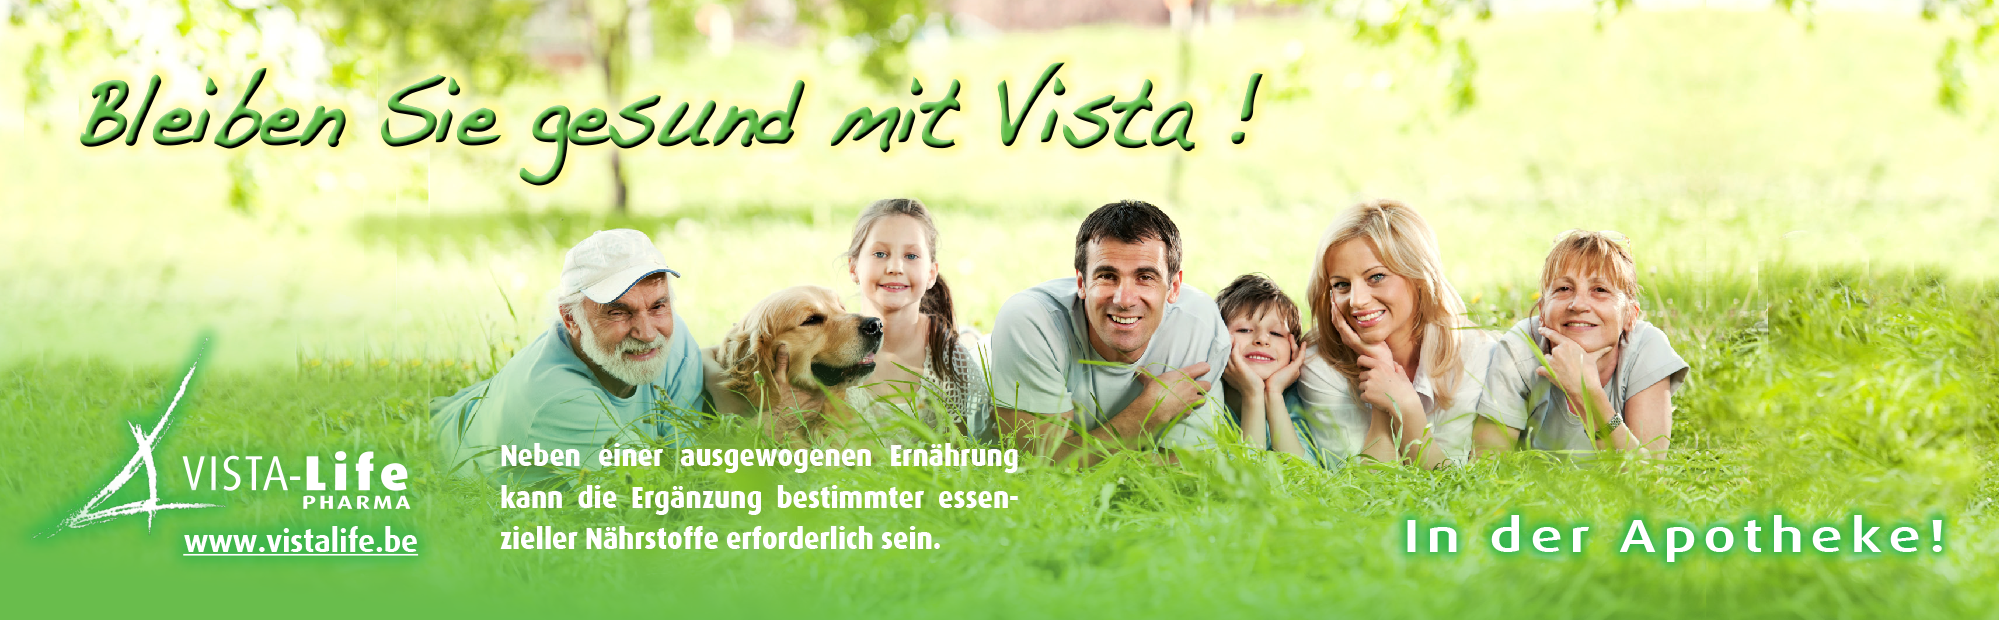 vista-life-pharma-(topbanner)2dui